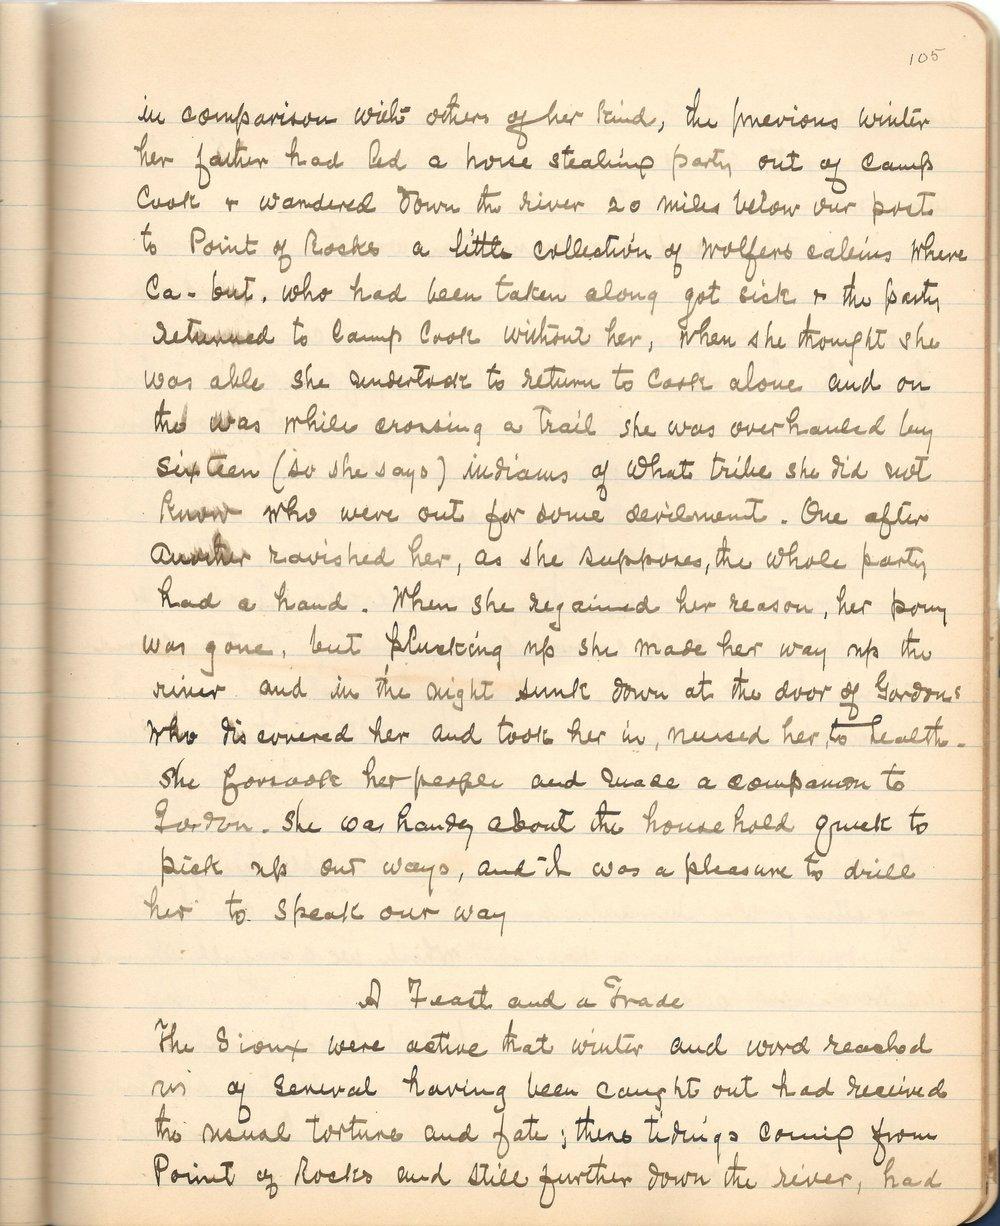 Page 105 of the memoir.